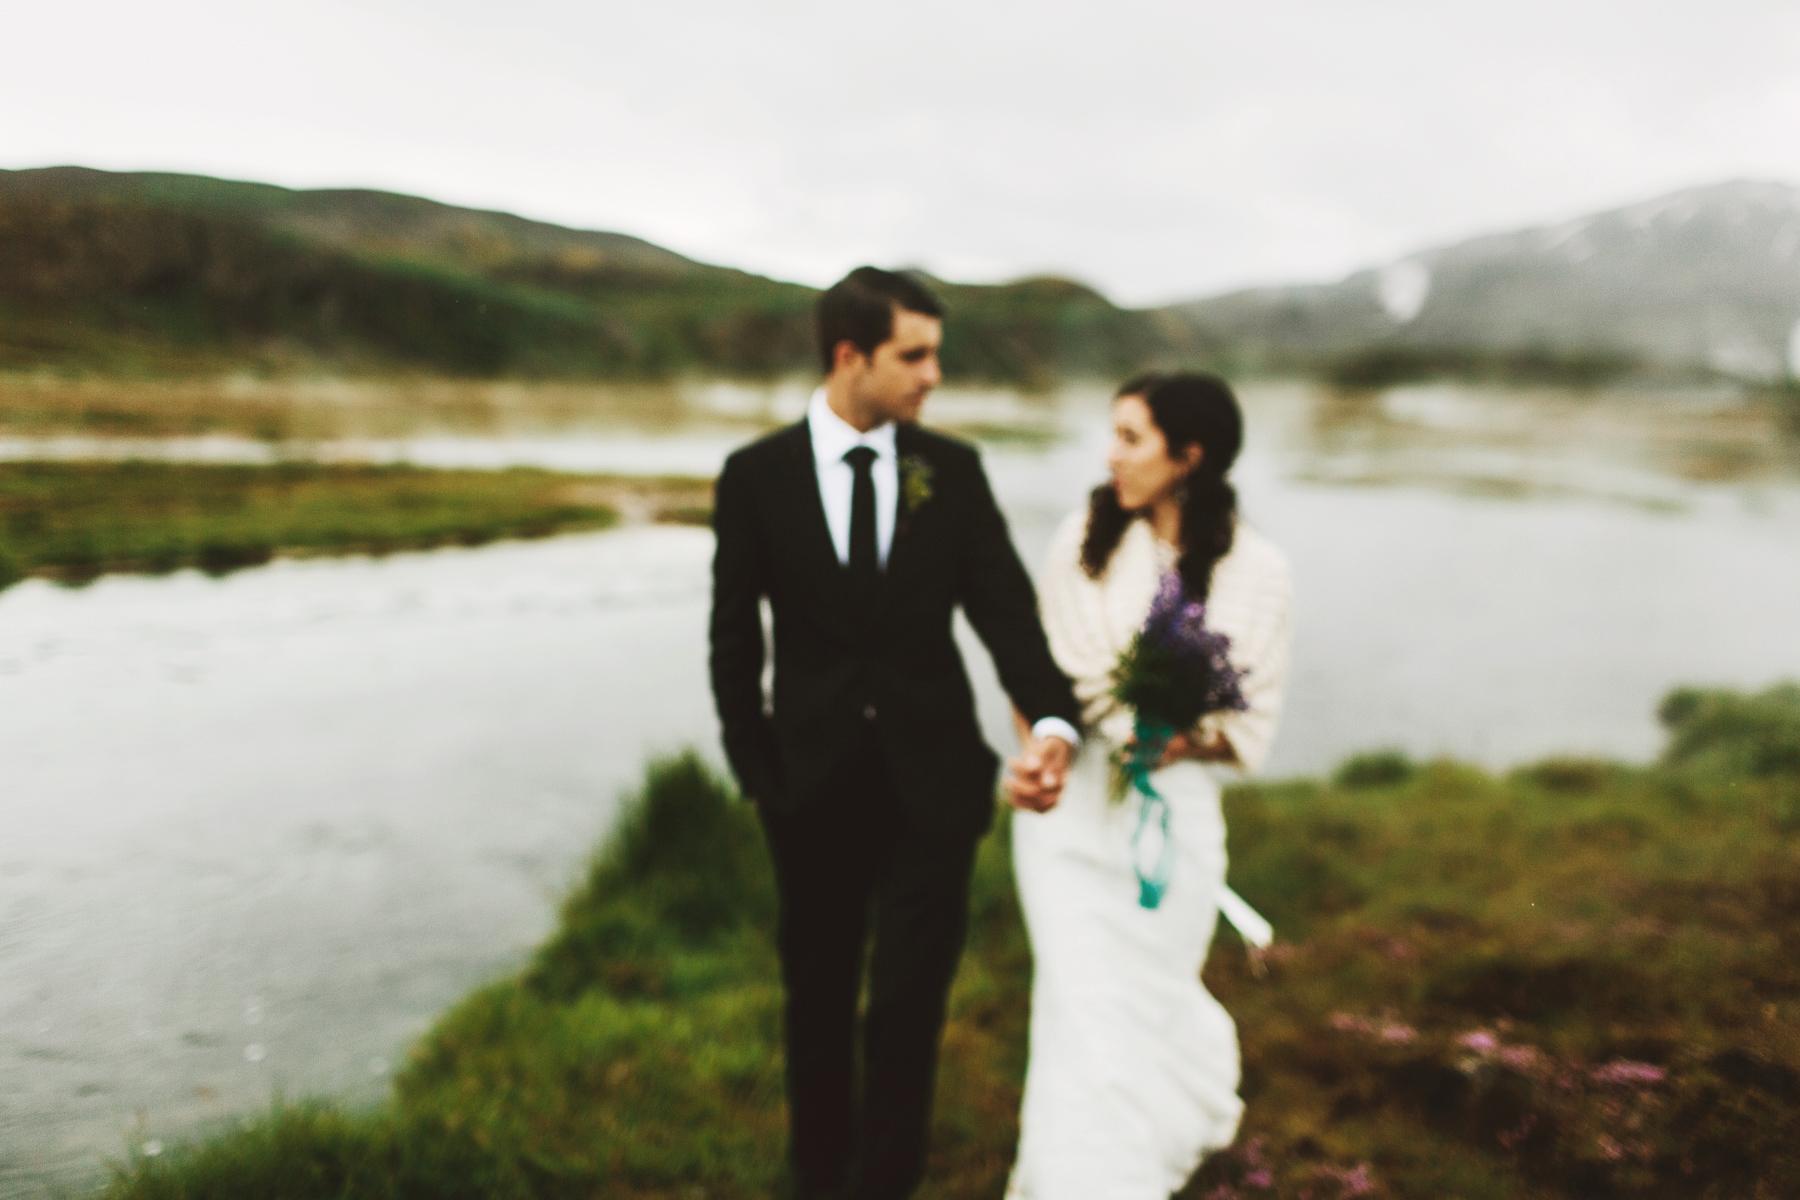 eec7ff4dc2 Alex and Alex . A Two Part Destination Wedding . Iceland Wedding ...